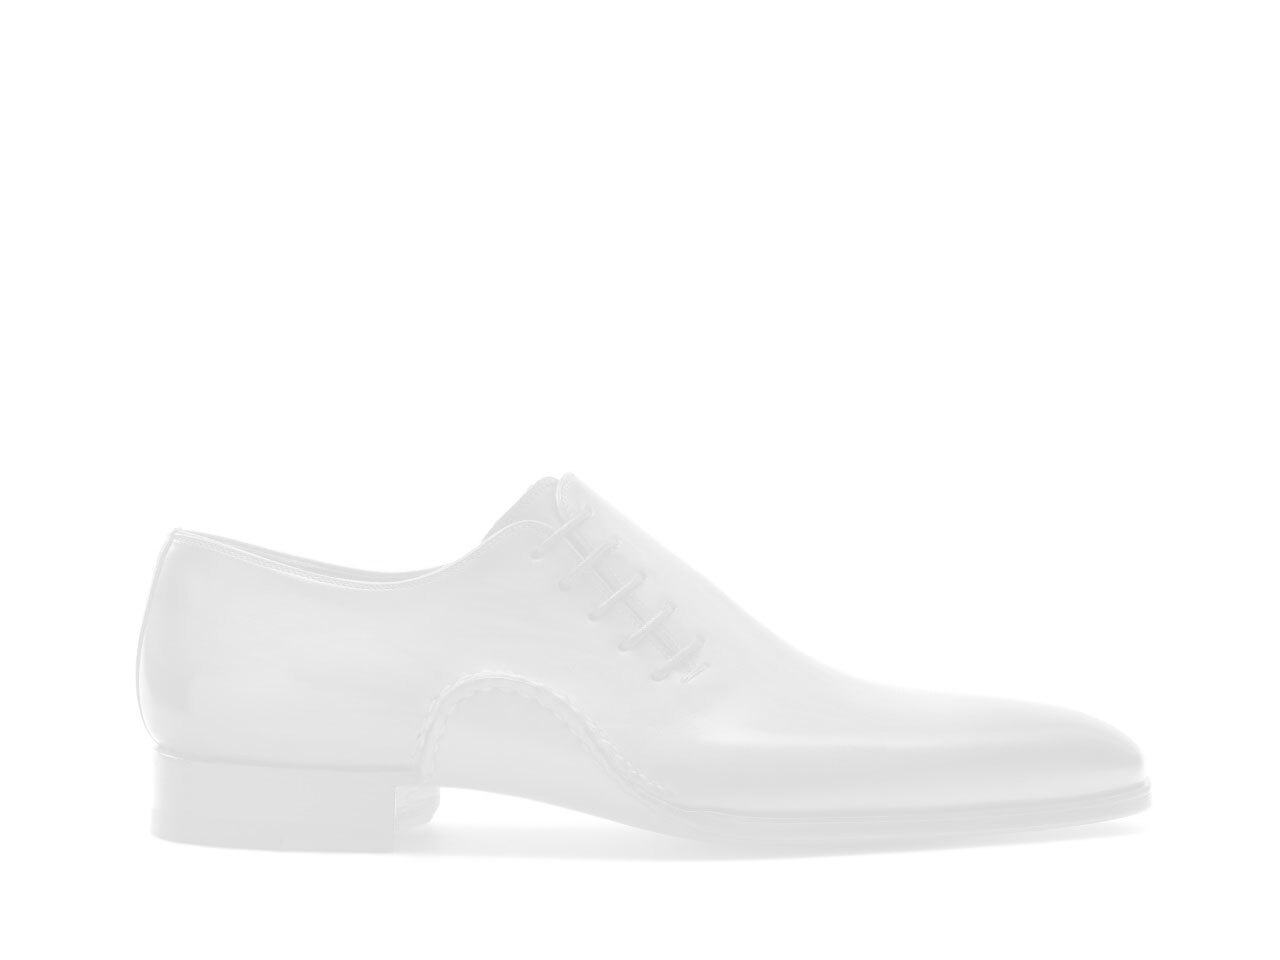 Pair of the Magnanni Plaka Cuero Men's Derby Shoes